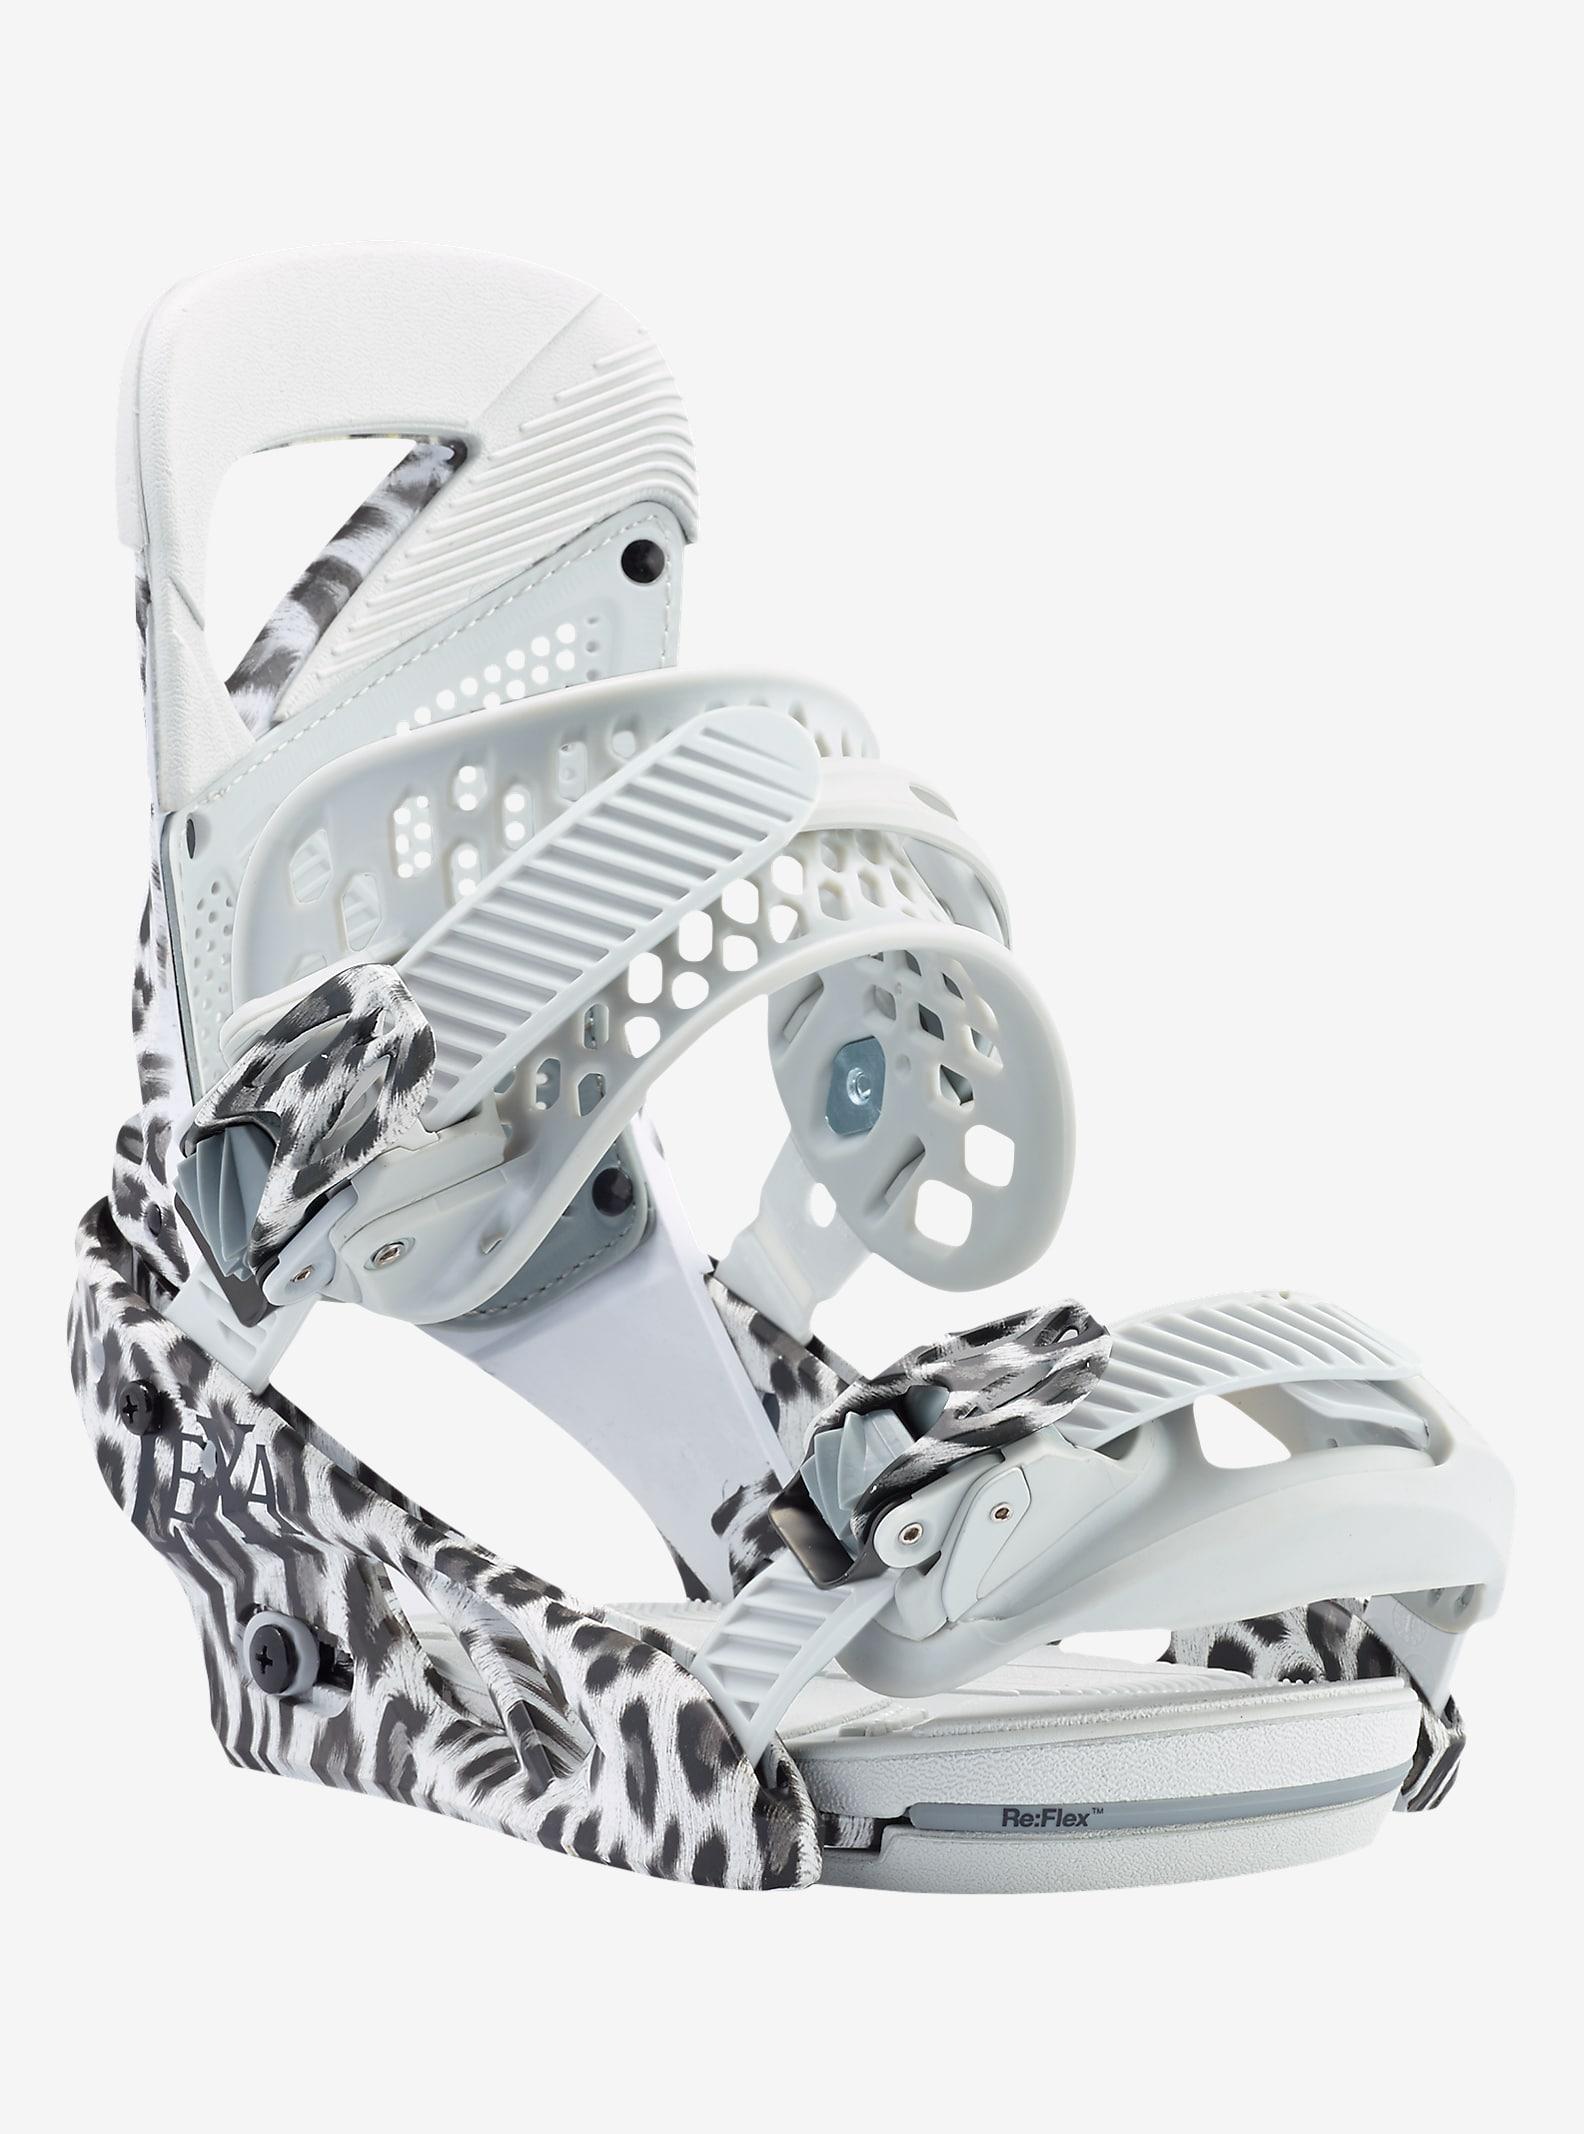 Burton Lexa Snowboard Binding shown in Snow Leopard